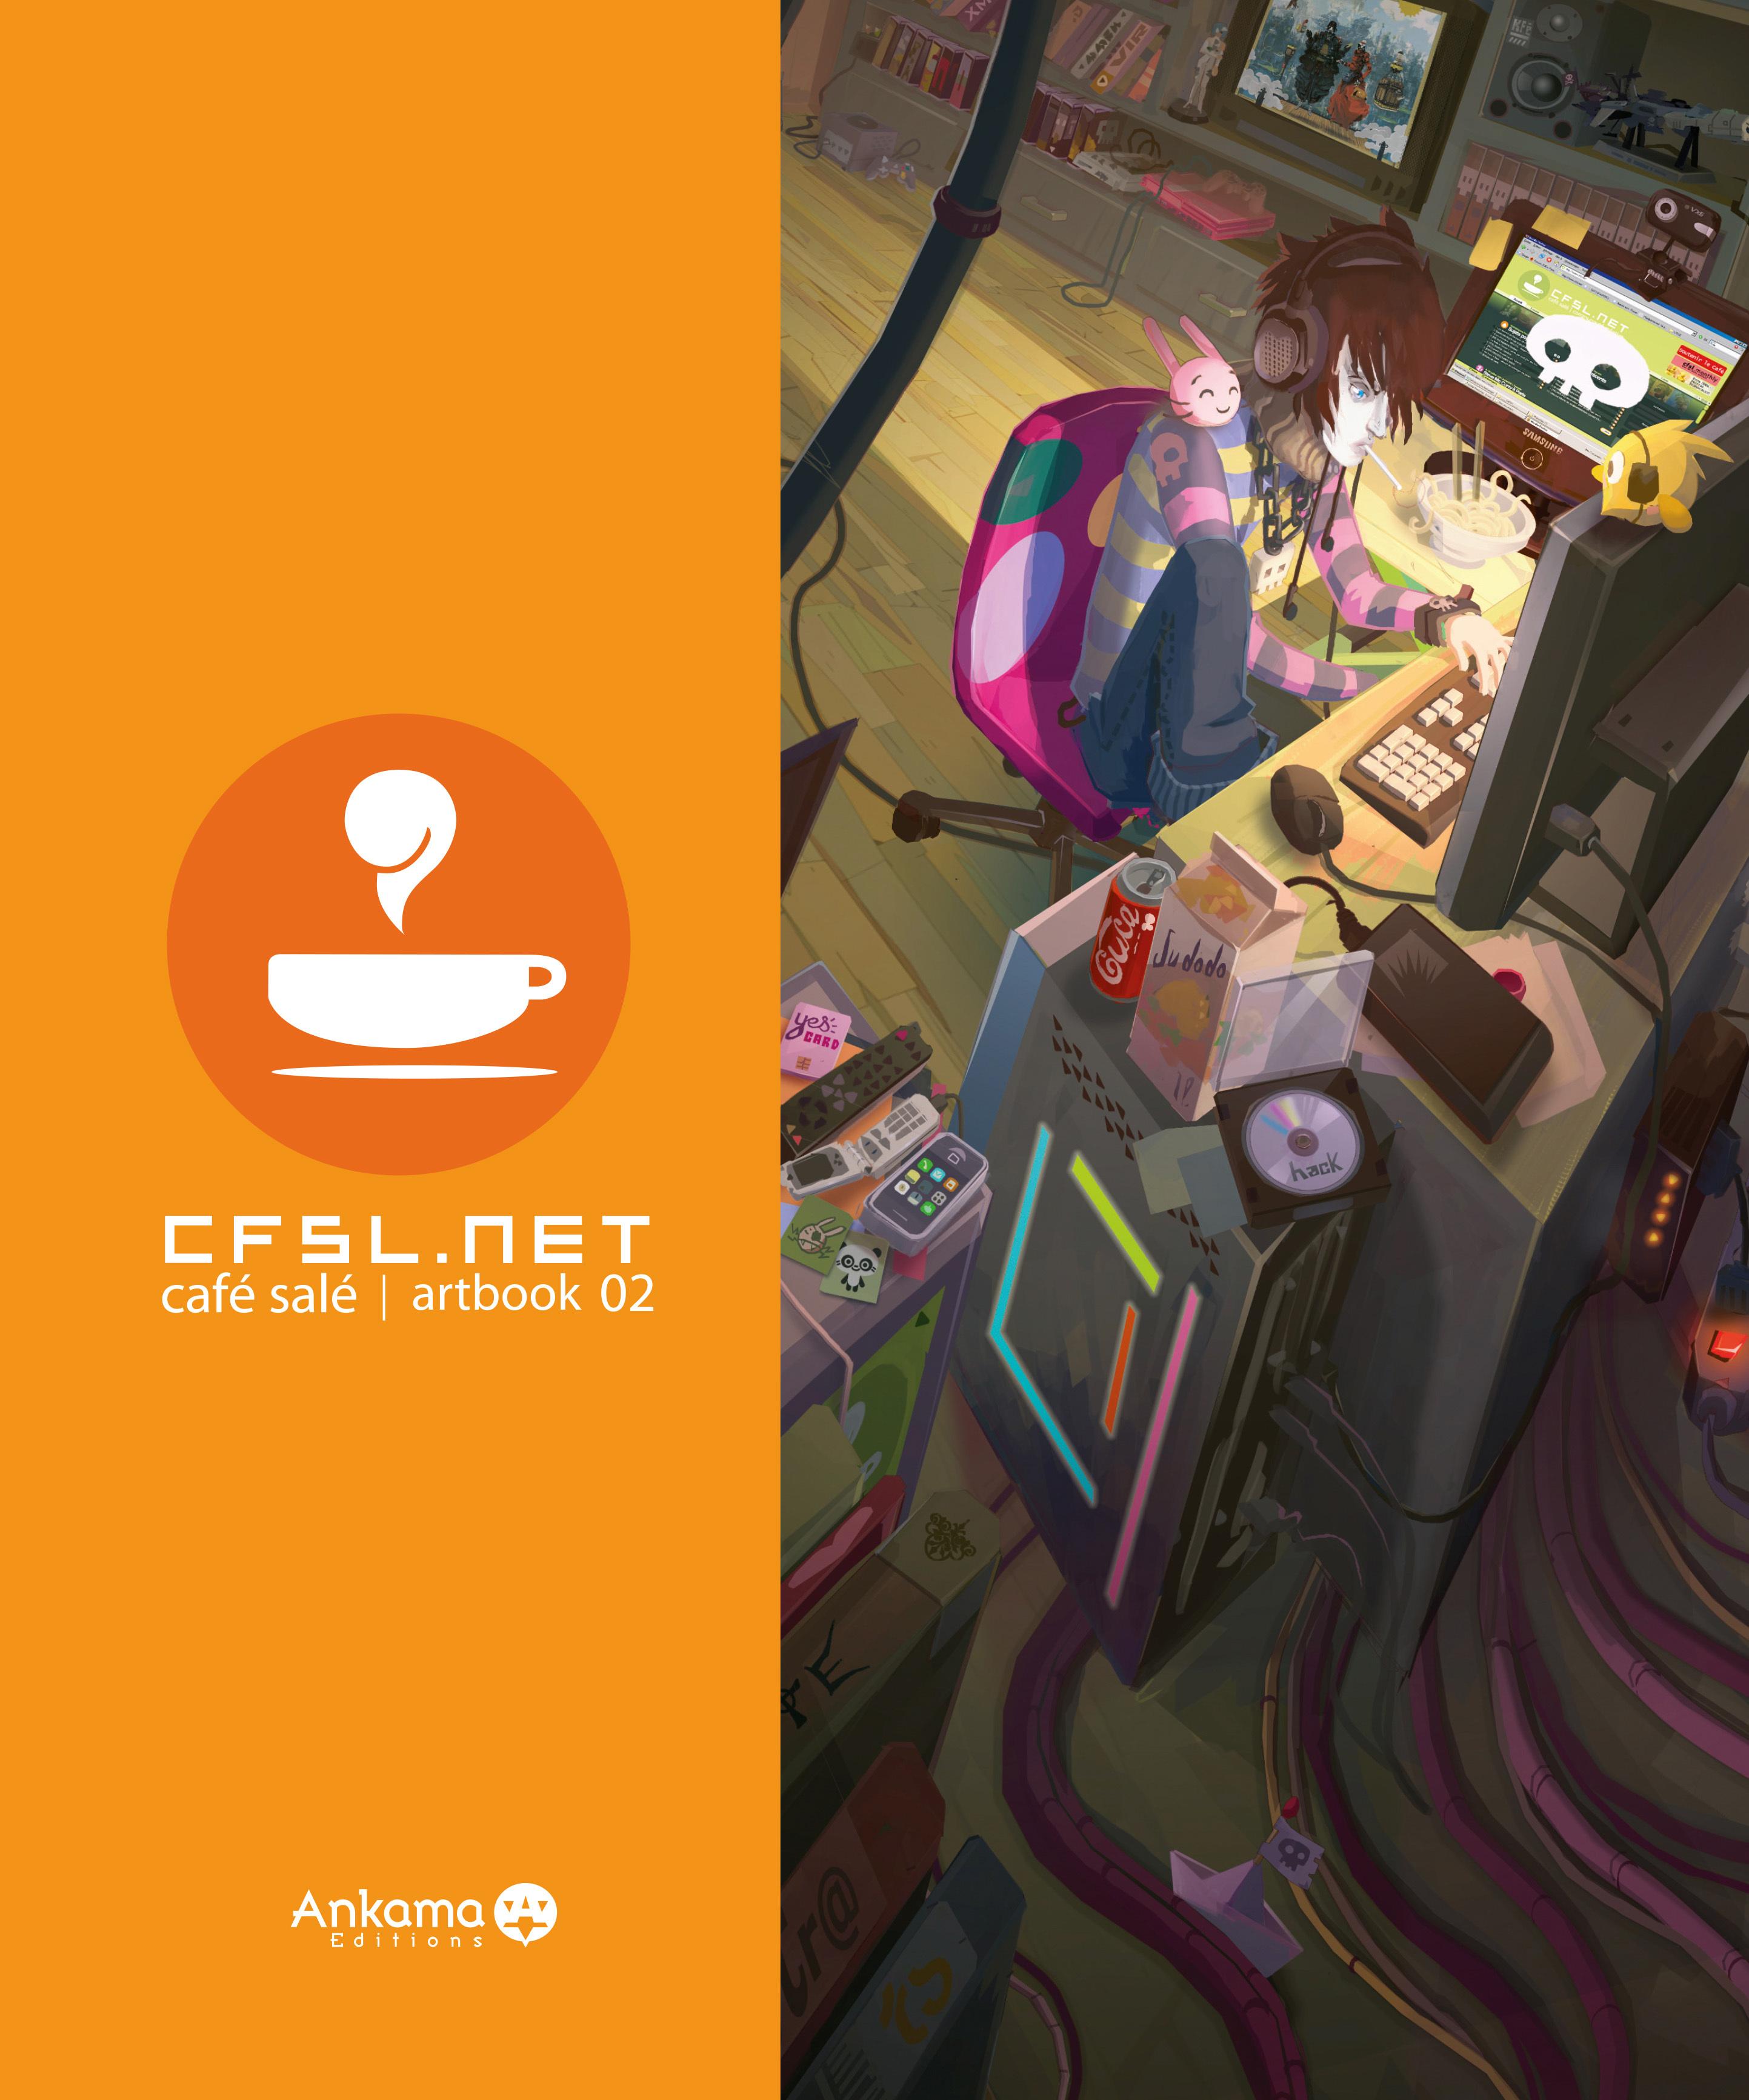 CFSL.NET CAFE SALE ARTBOOK T02